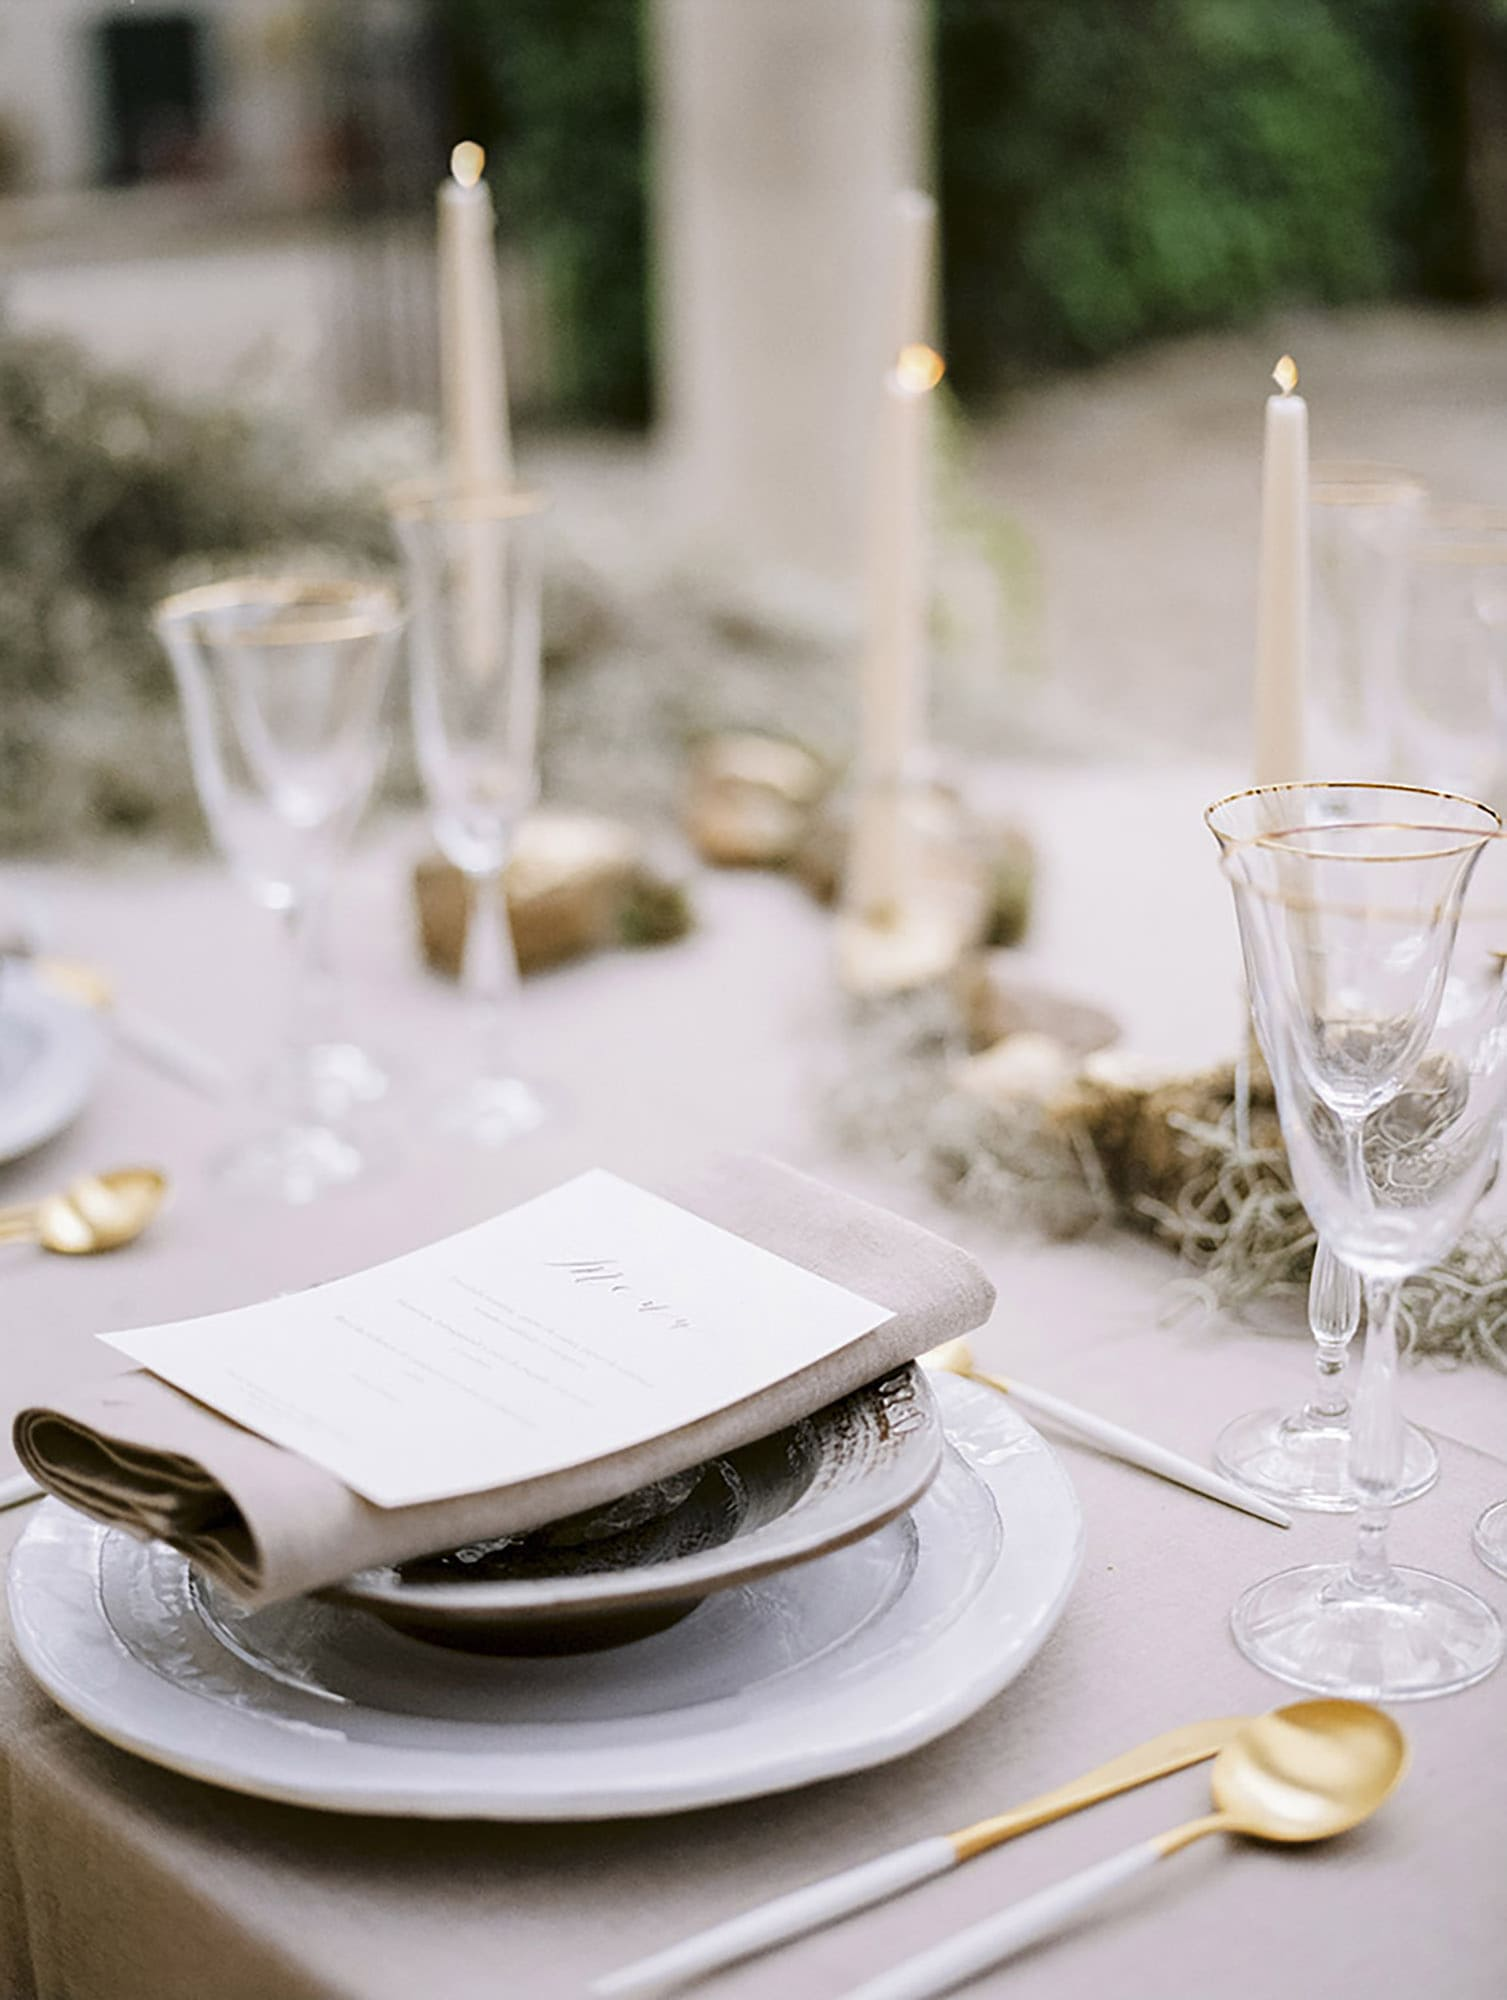 Lidia-Event-Wedding-Home-Plato.jpg